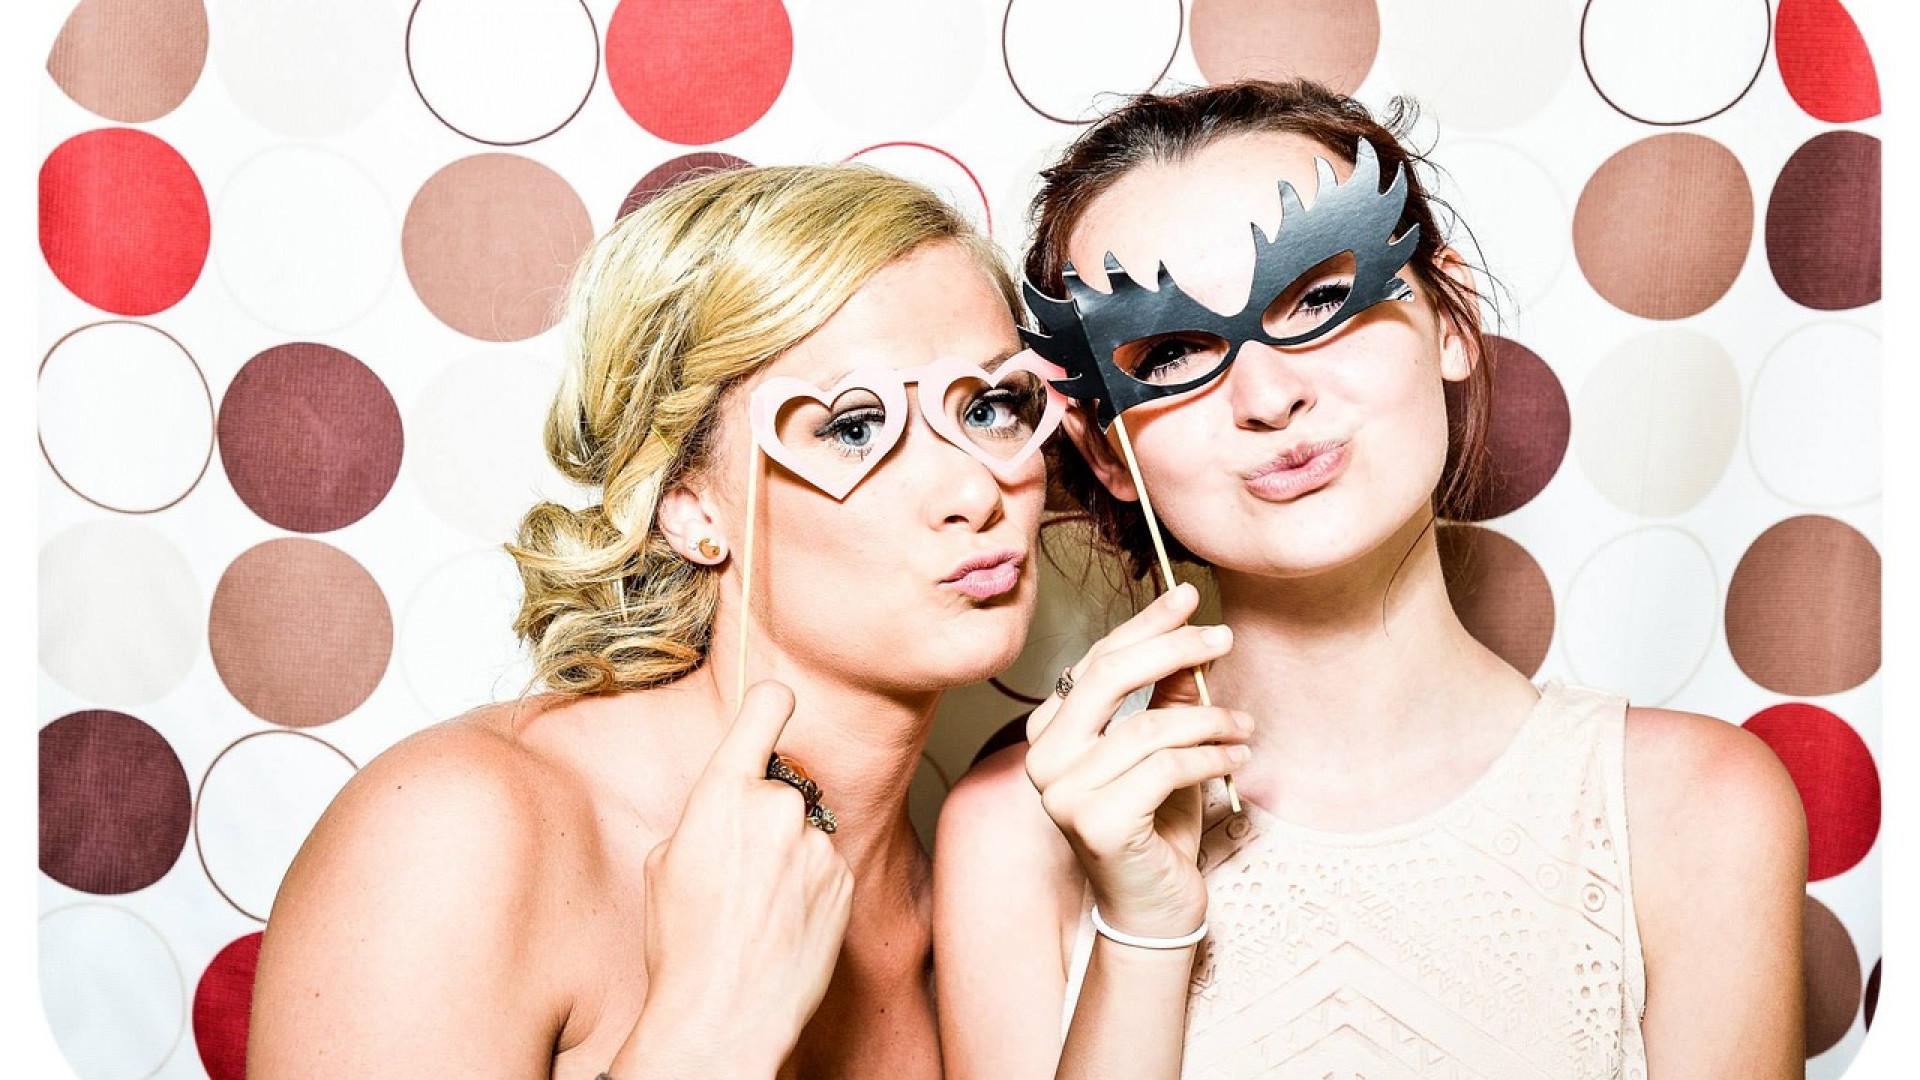 Mariage : pourquoi penser au photobooth ?